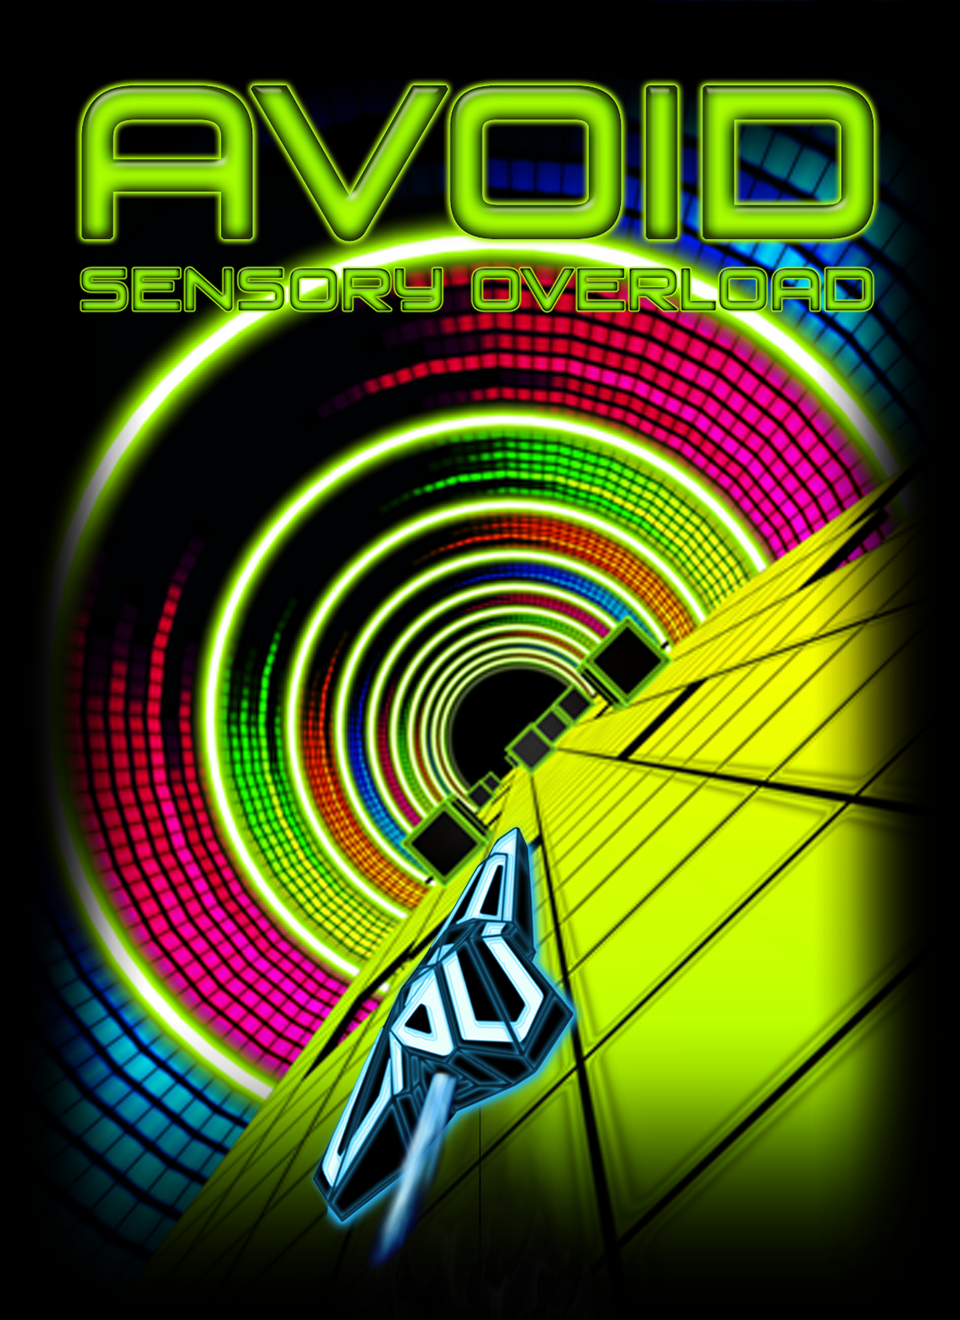 avoid sensory overload windows mac mobile ios ipad android androidtab game mod db